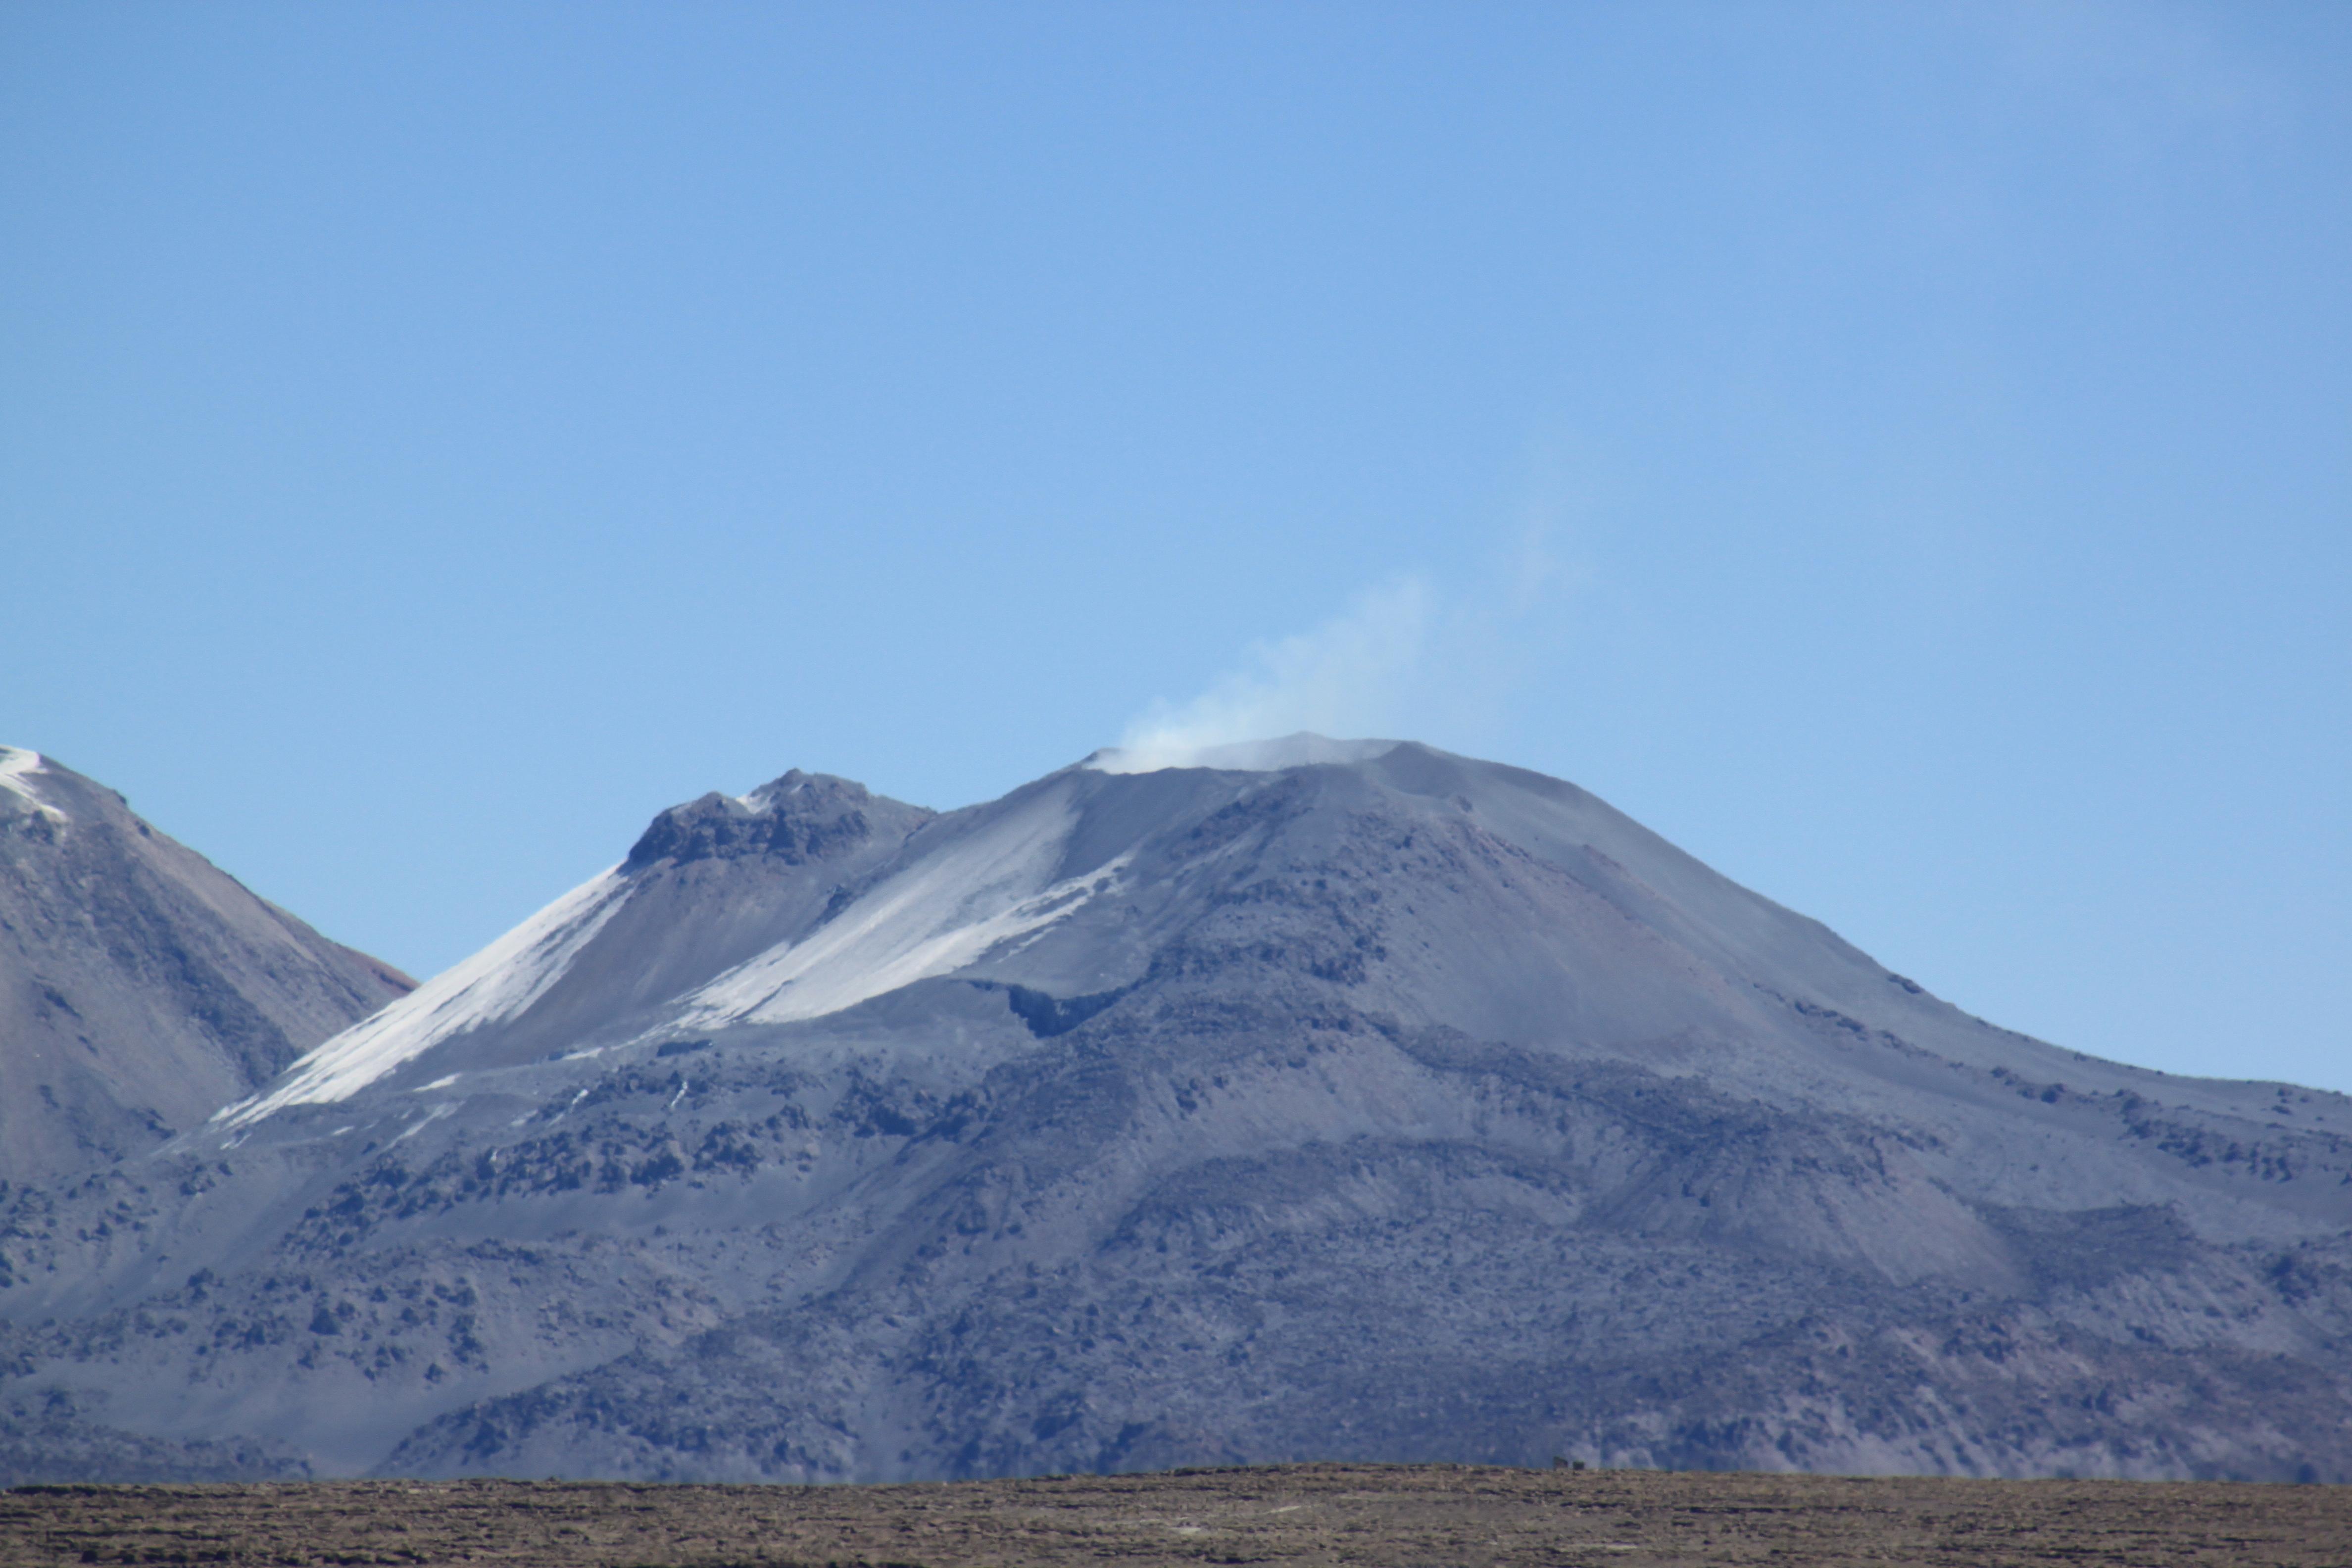 Climbing El Misti Volcano